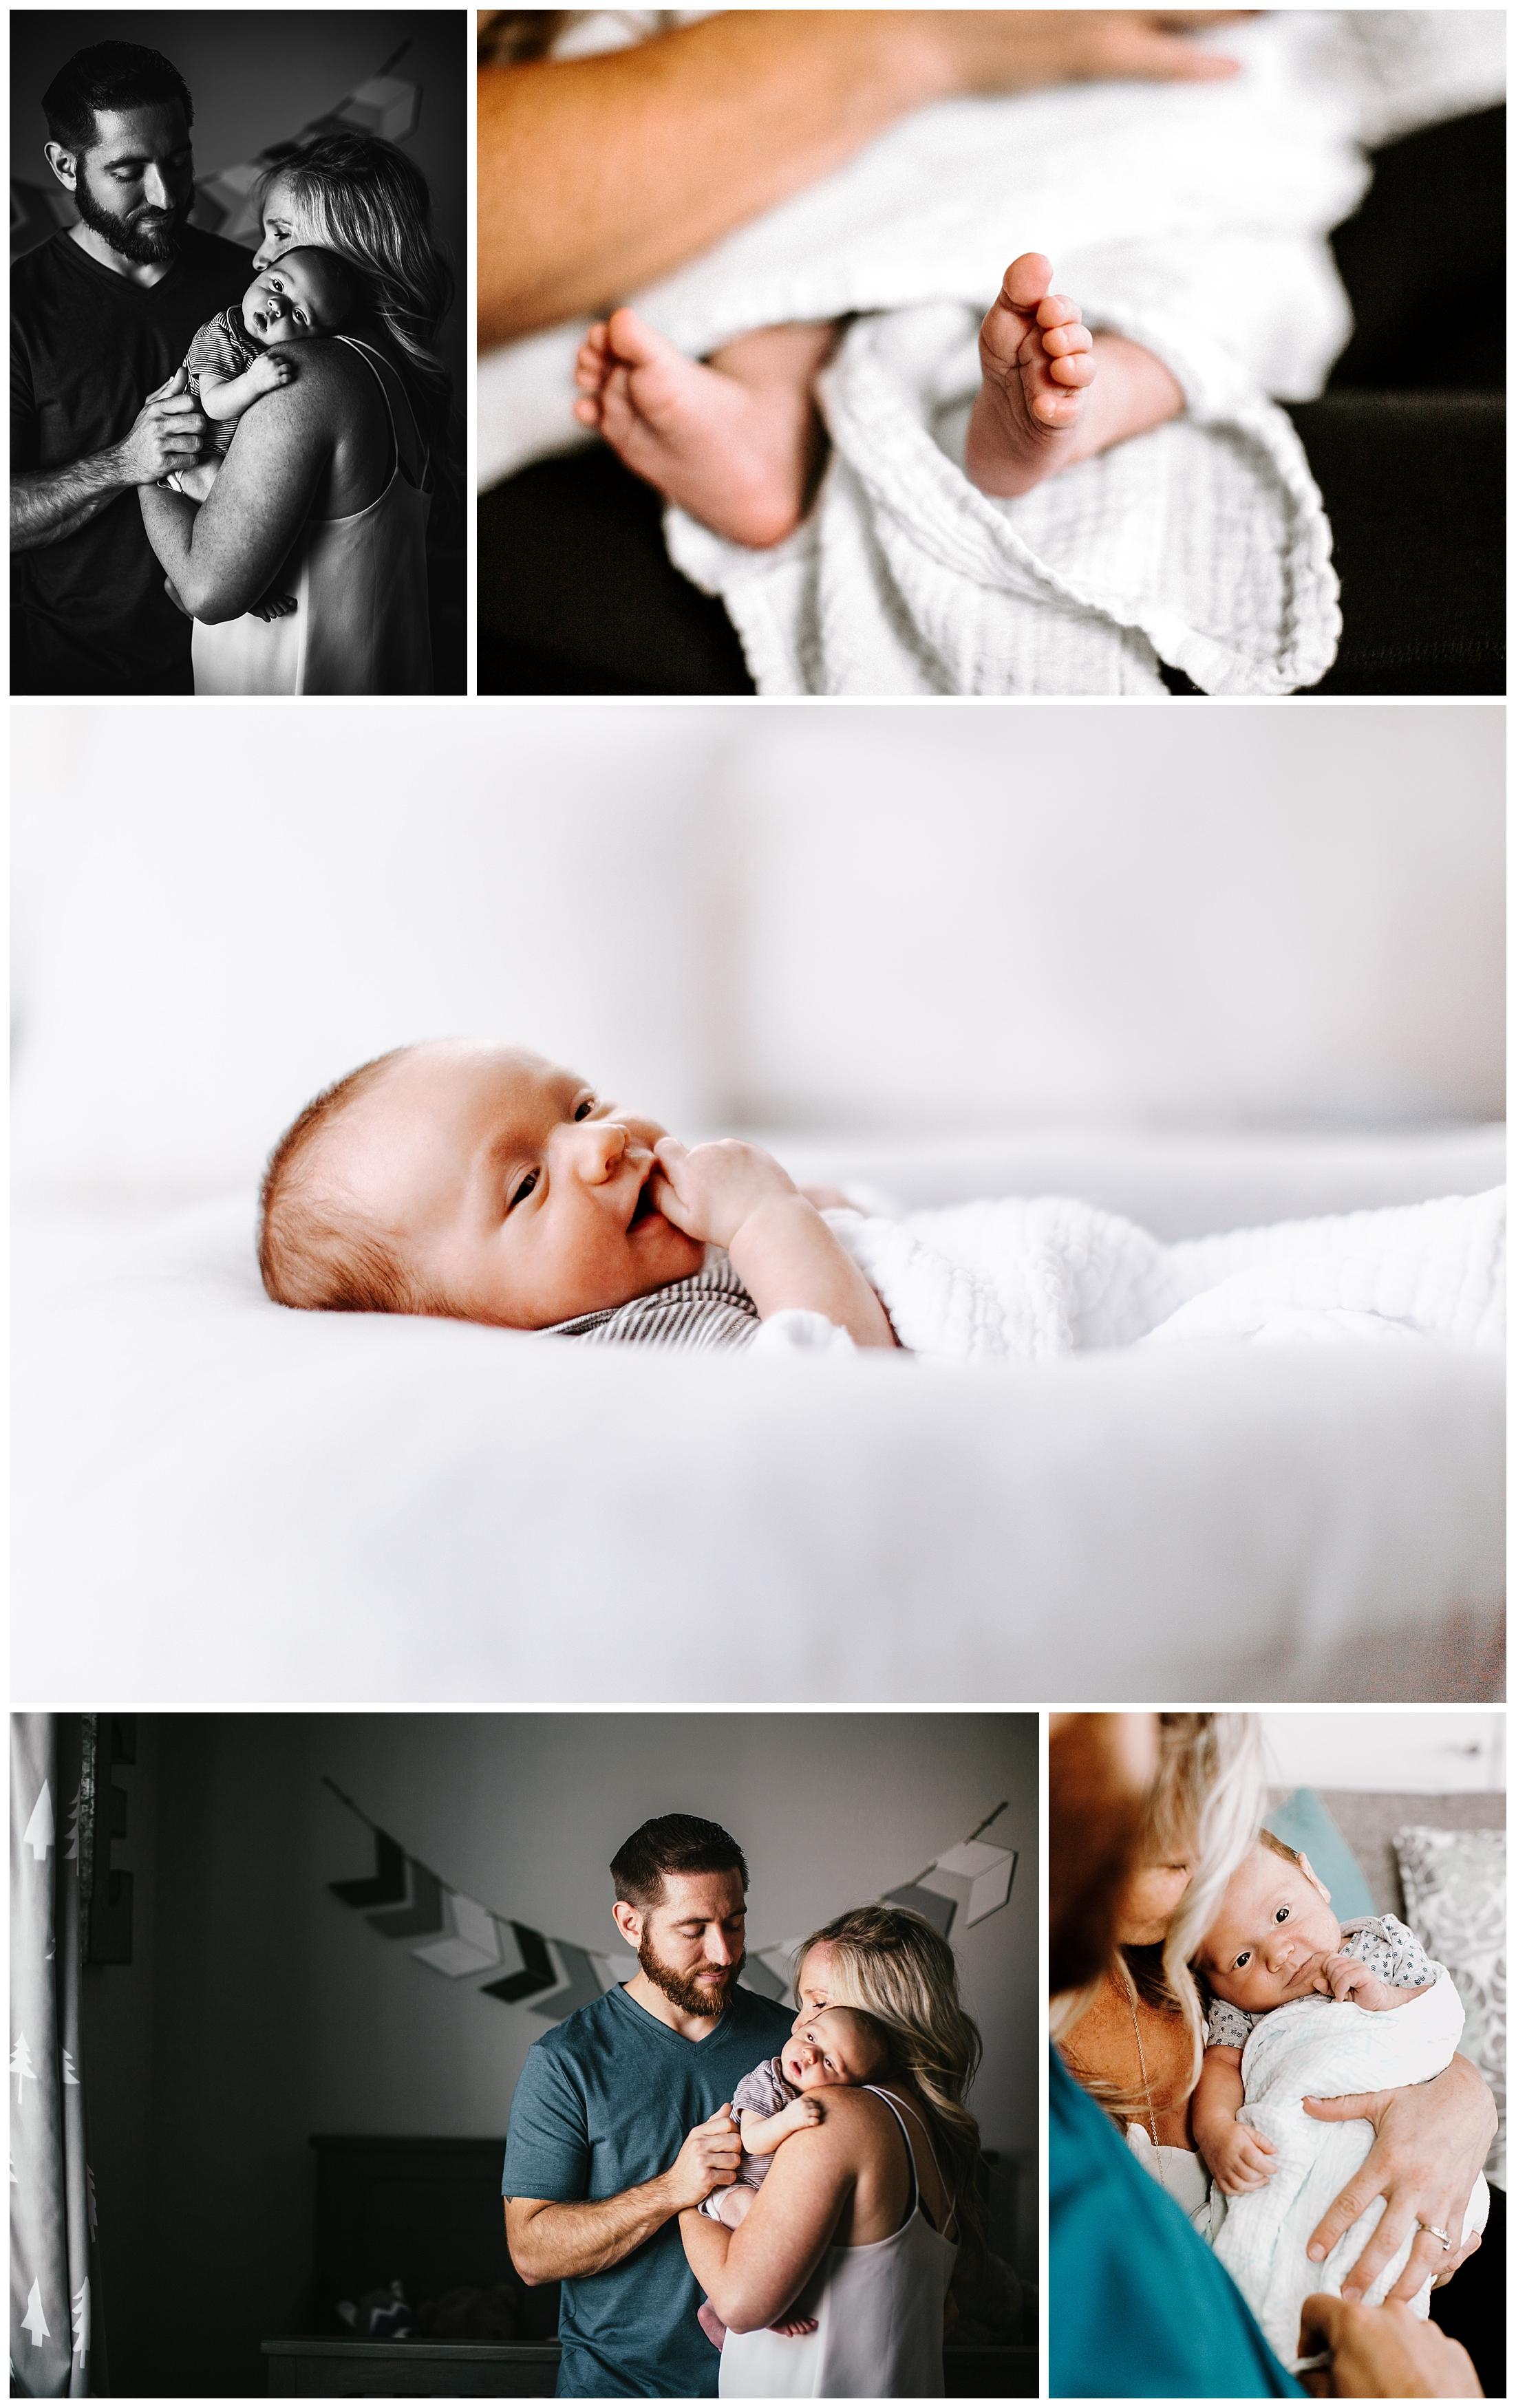 Newborn_Photography_Lifestyle_Spokane.jpg